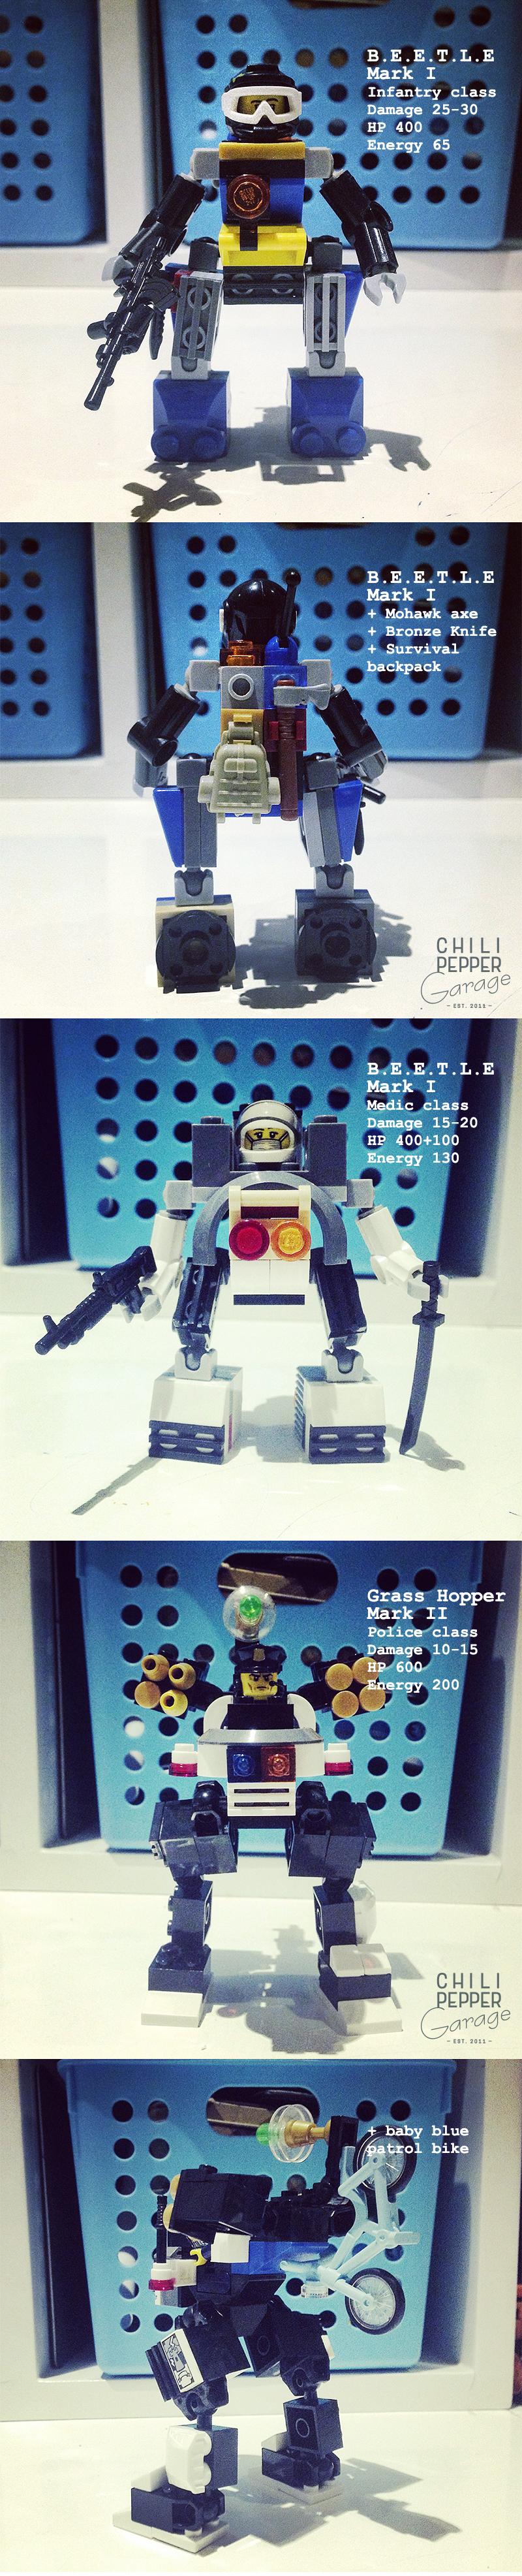 lego-custom-suit.jpg